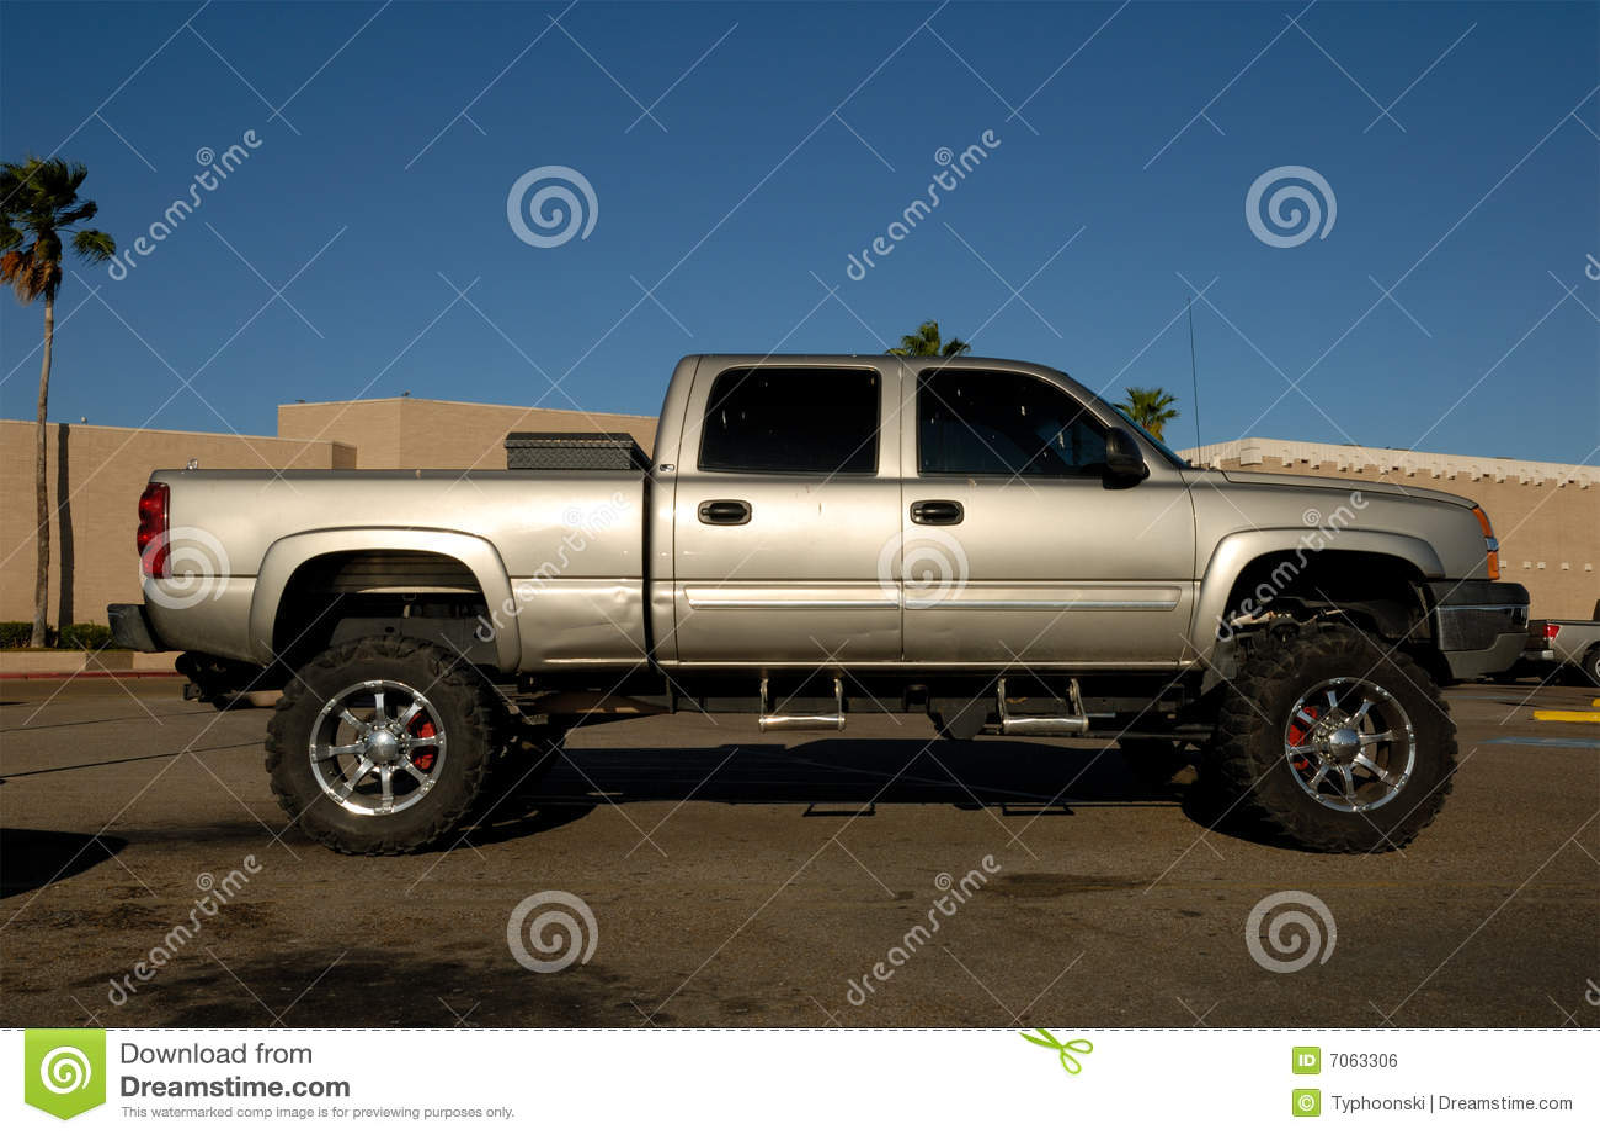 American pickup truck stock photo. Image of wheels, truck ...